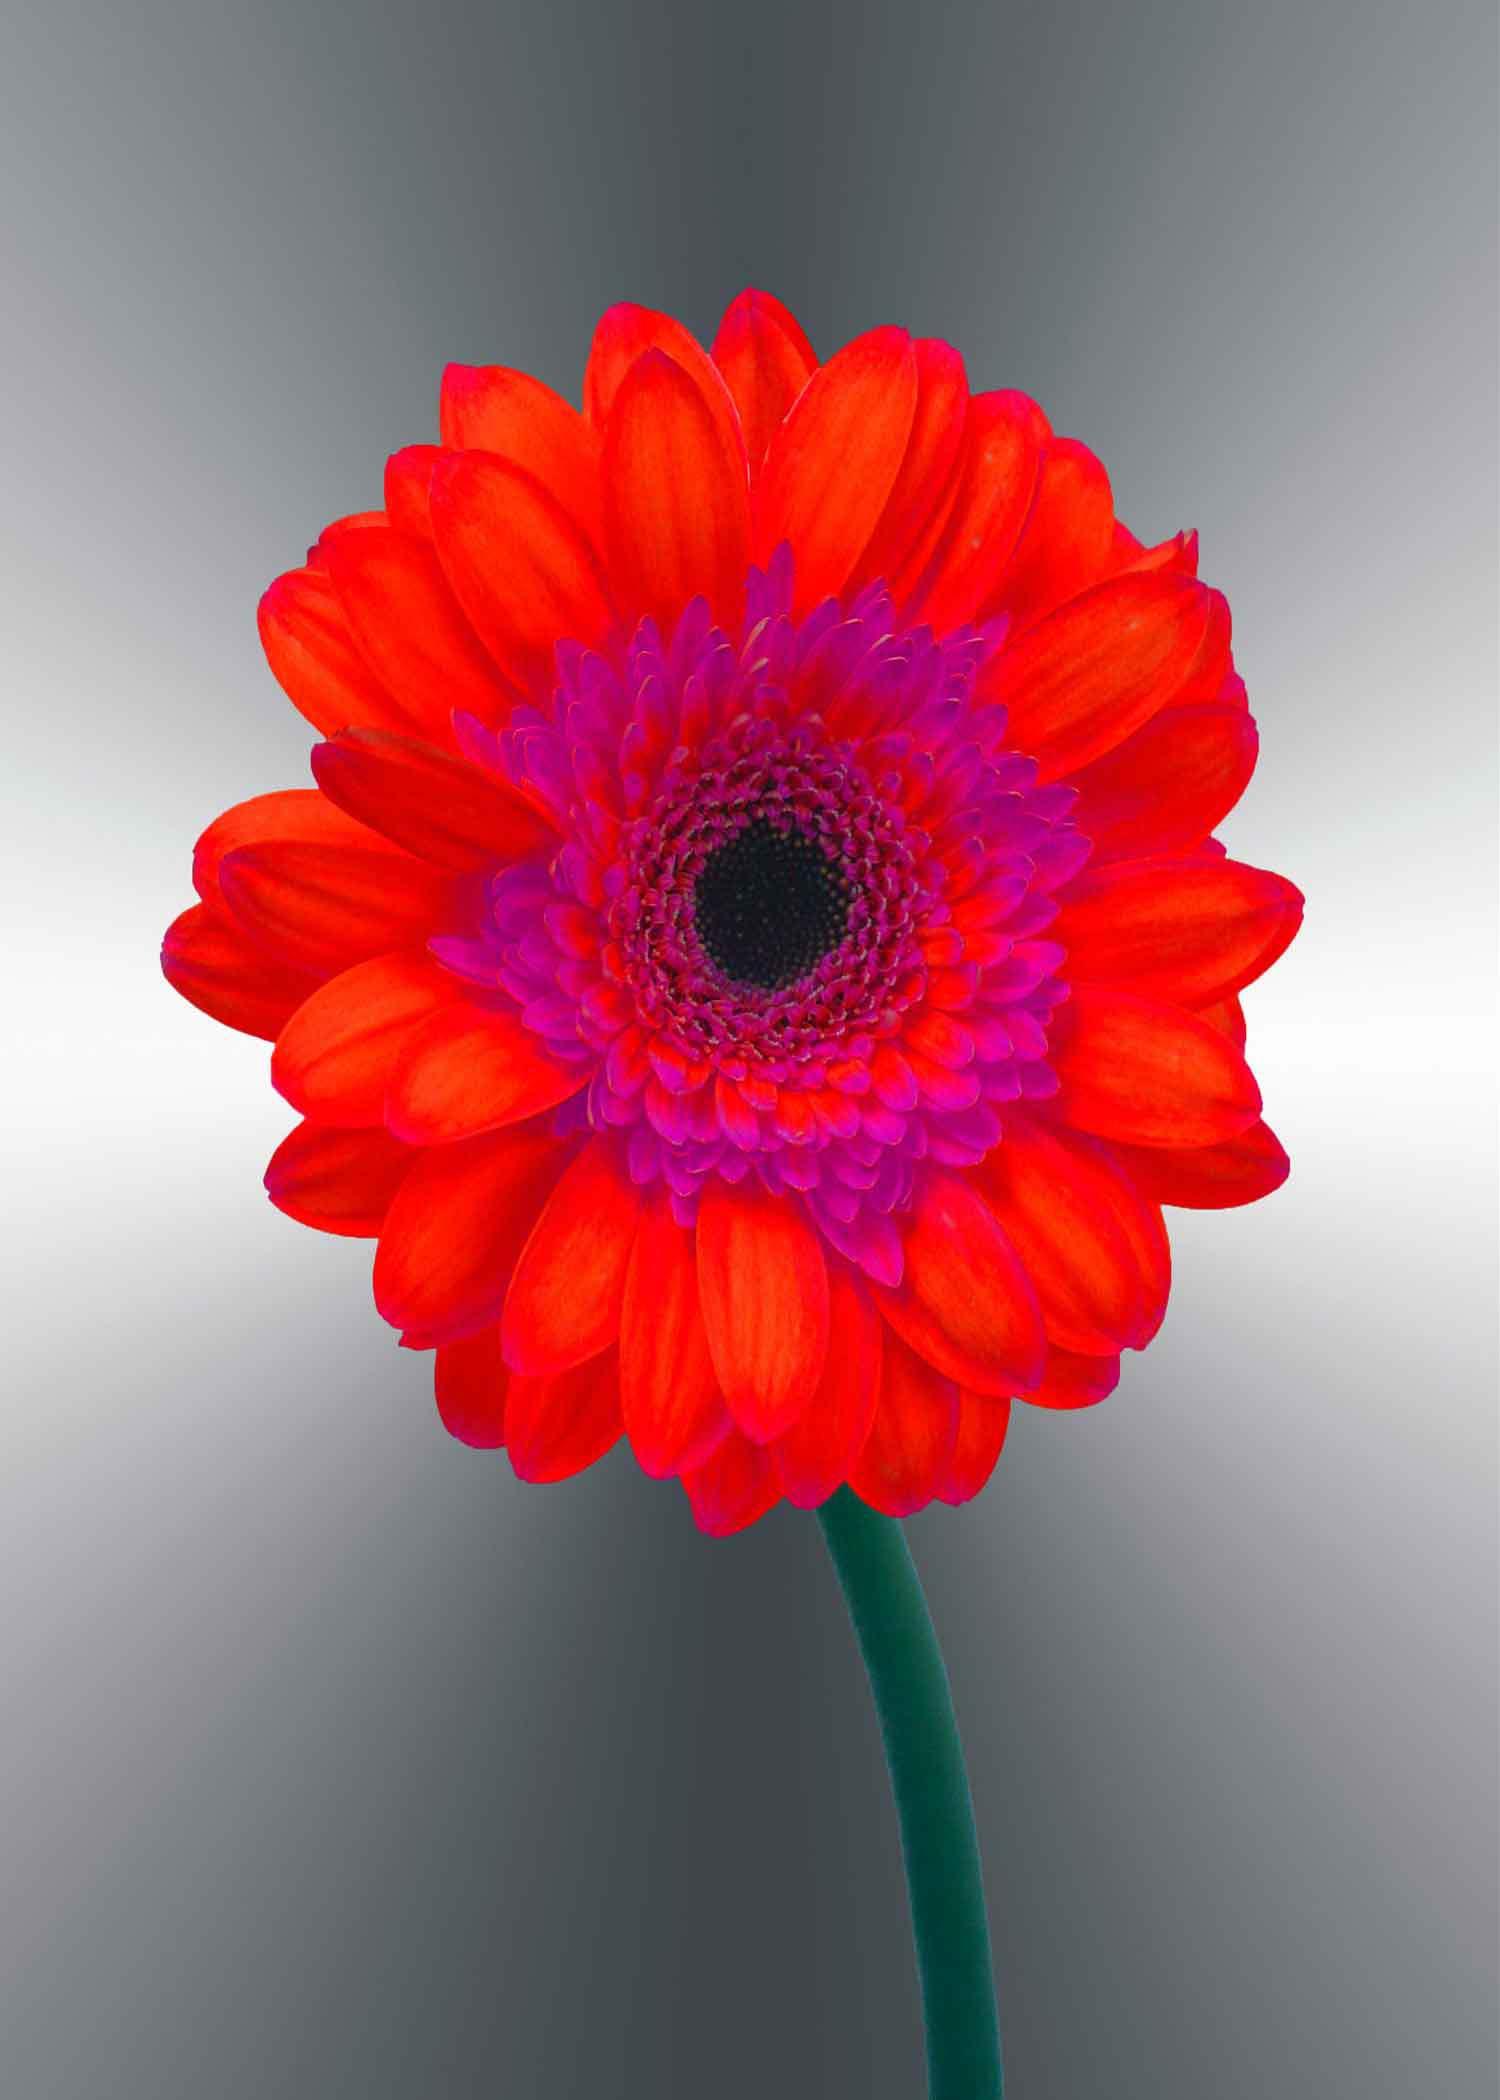 red-gerger-daisy-5x7-(22-of-236)-Edit-2-copy-6.jpg